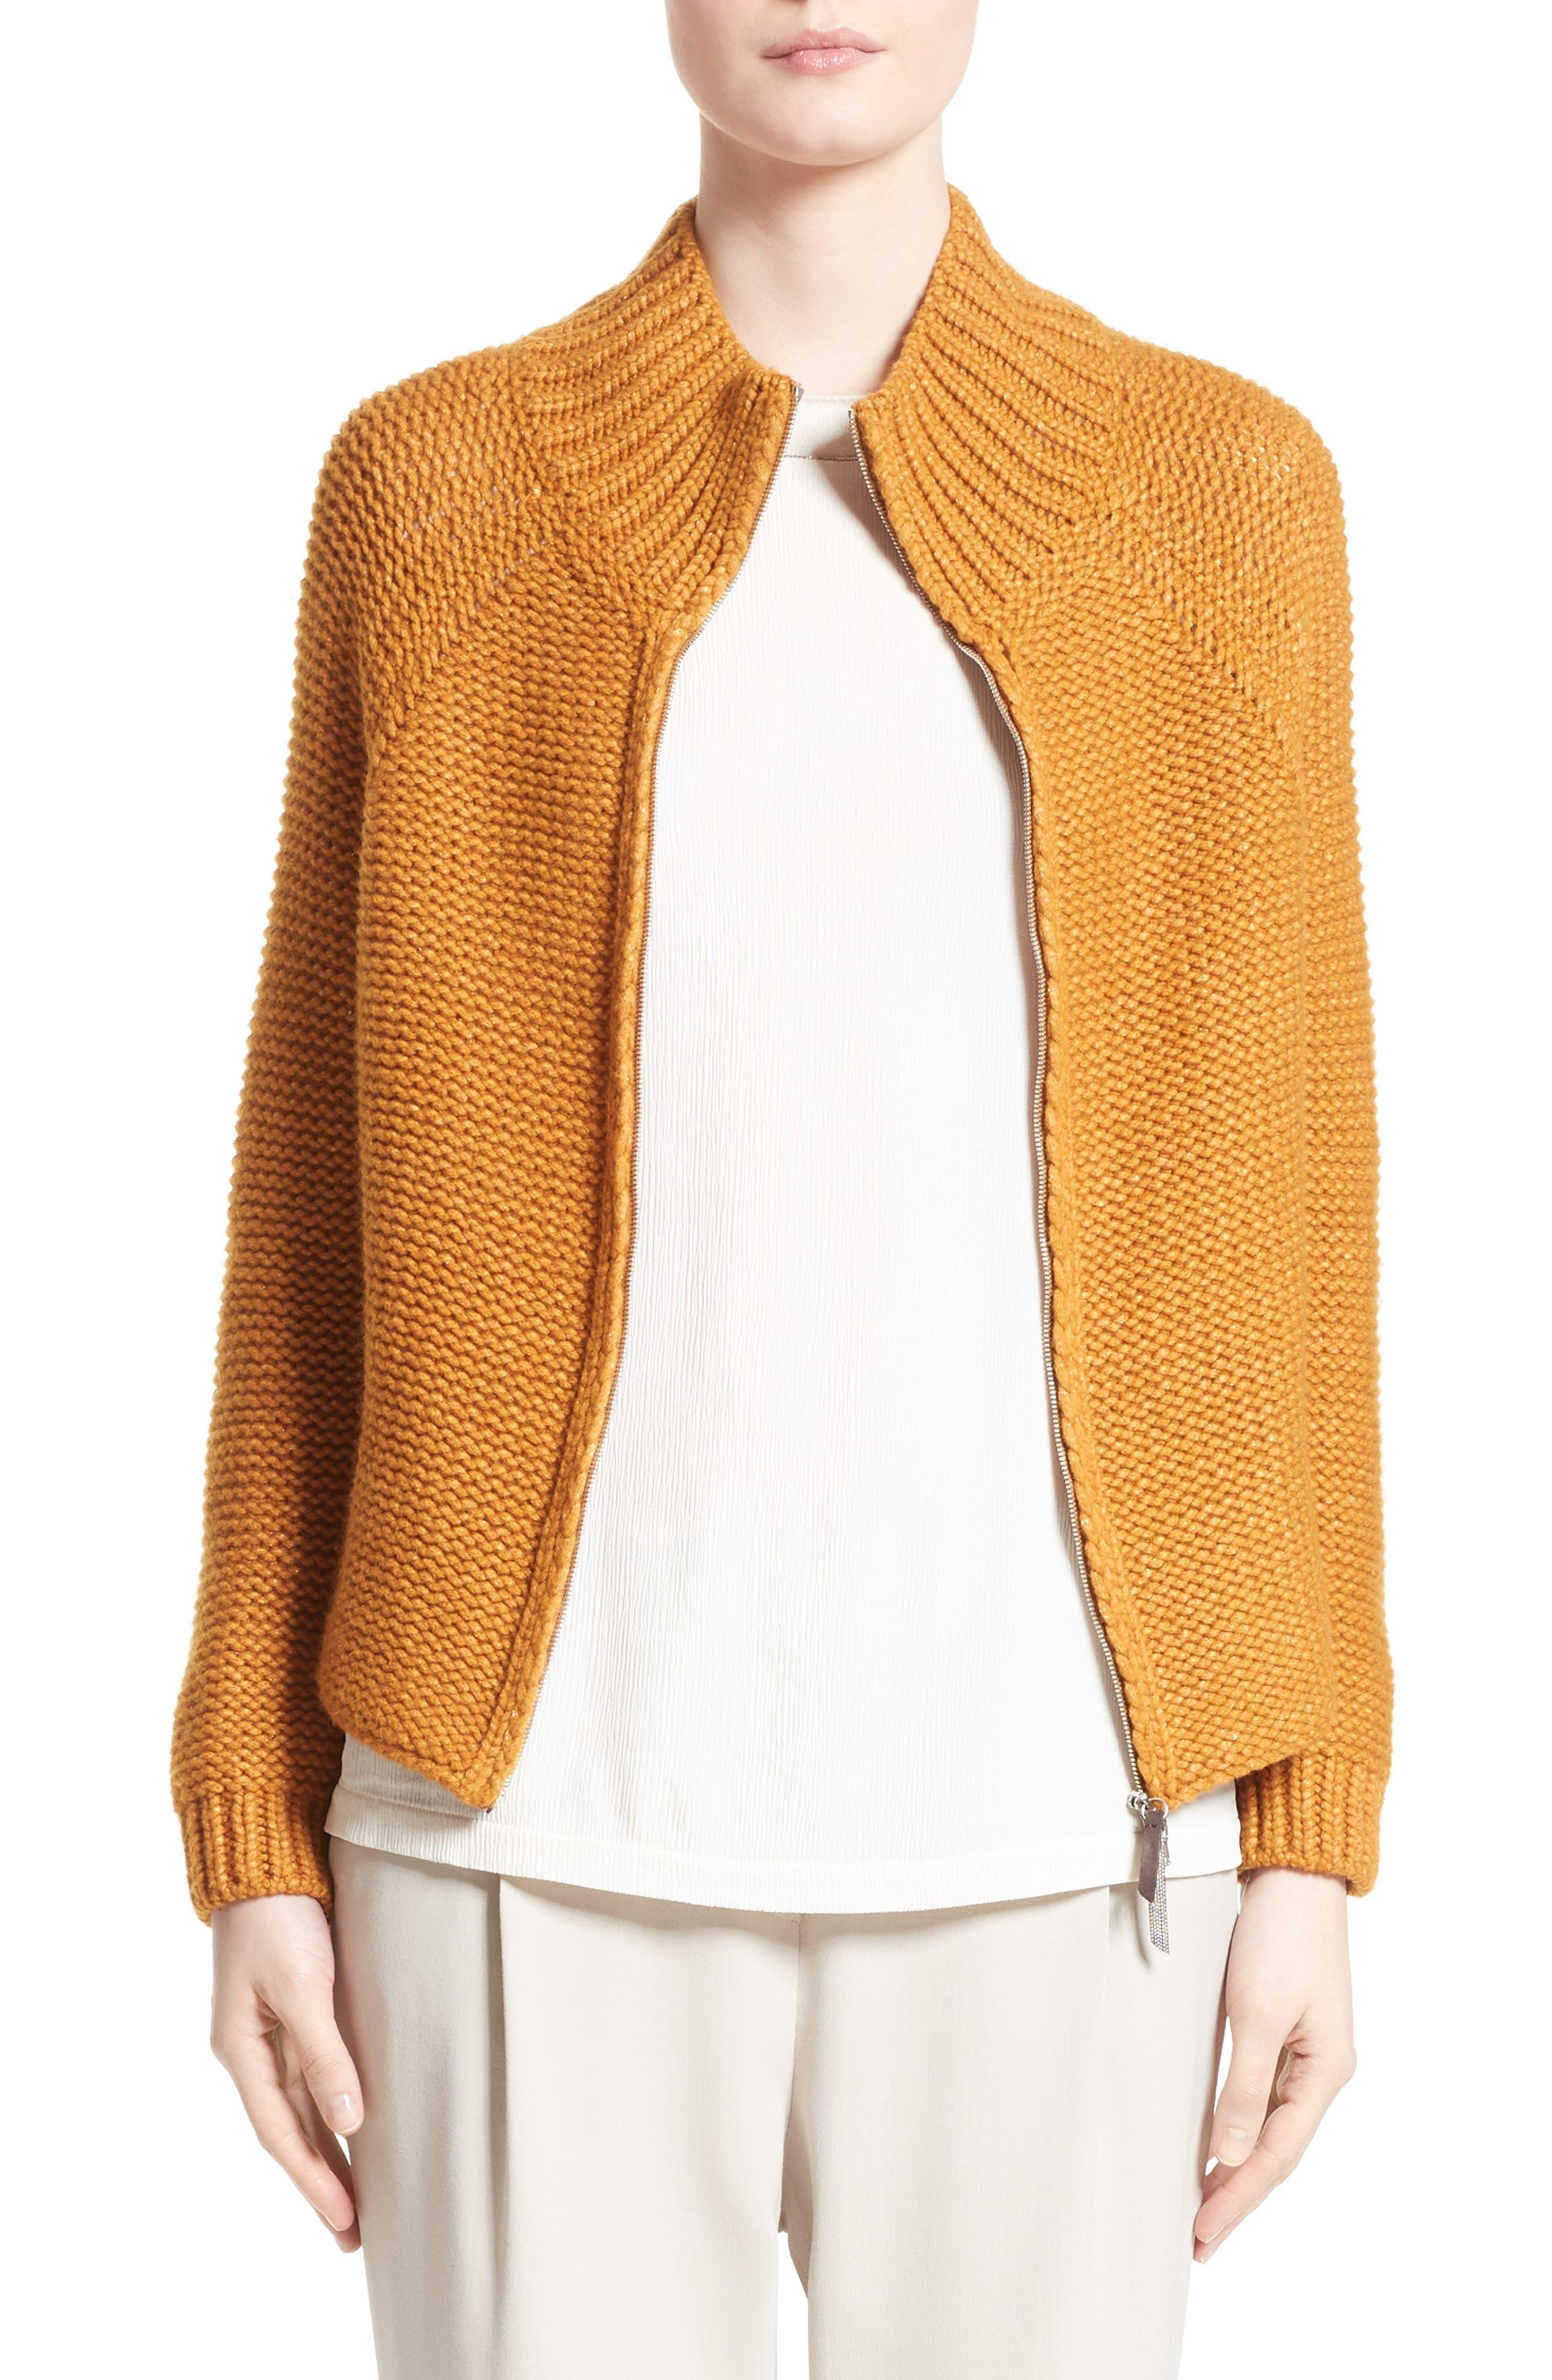 Main Image - Fabiana Filippi Knit Wool Blend Cardigan